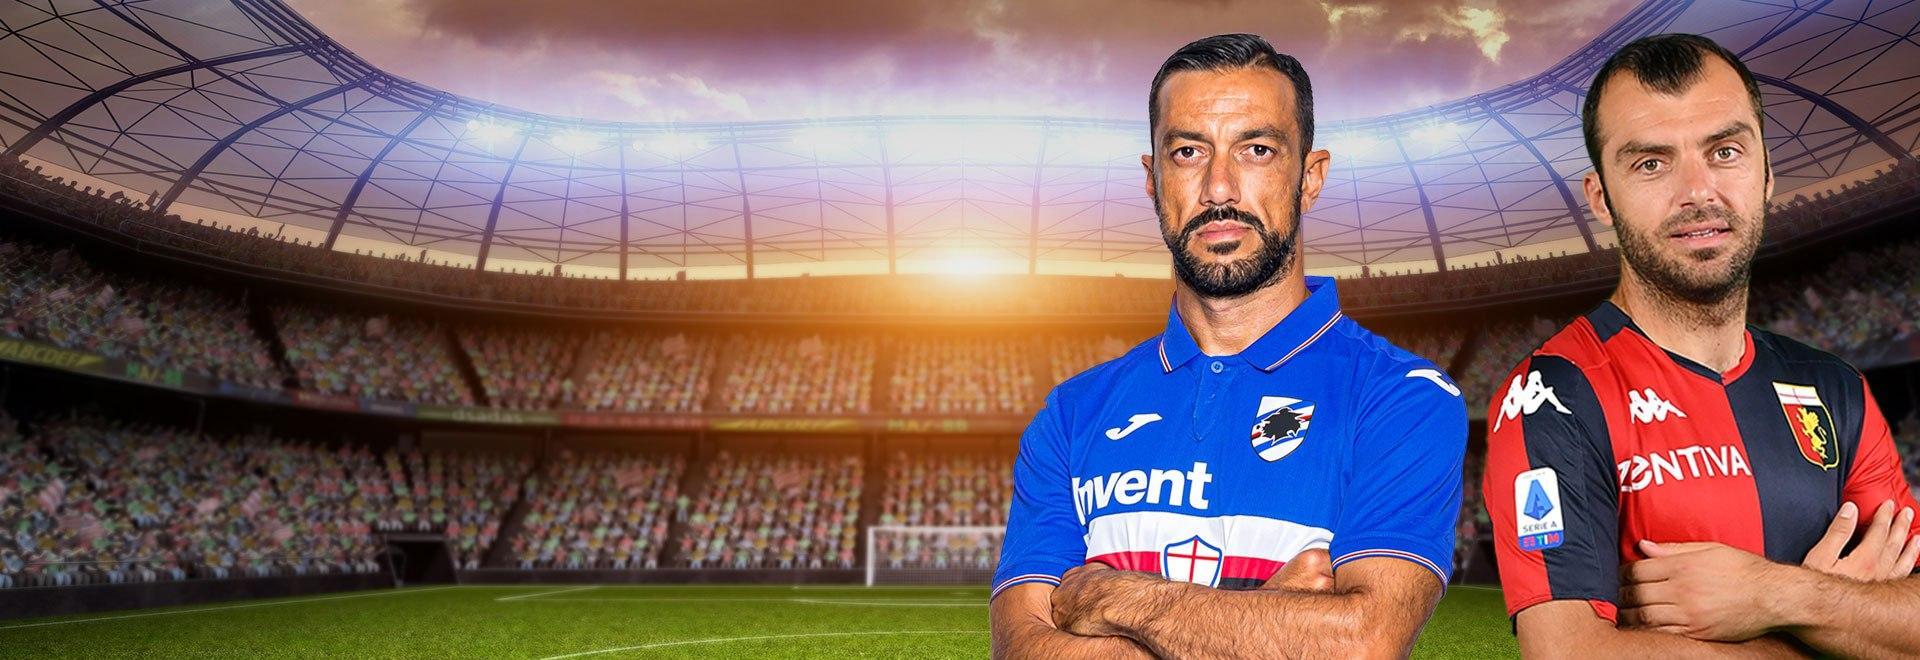 Sampdoria - Genoa. 35a g.